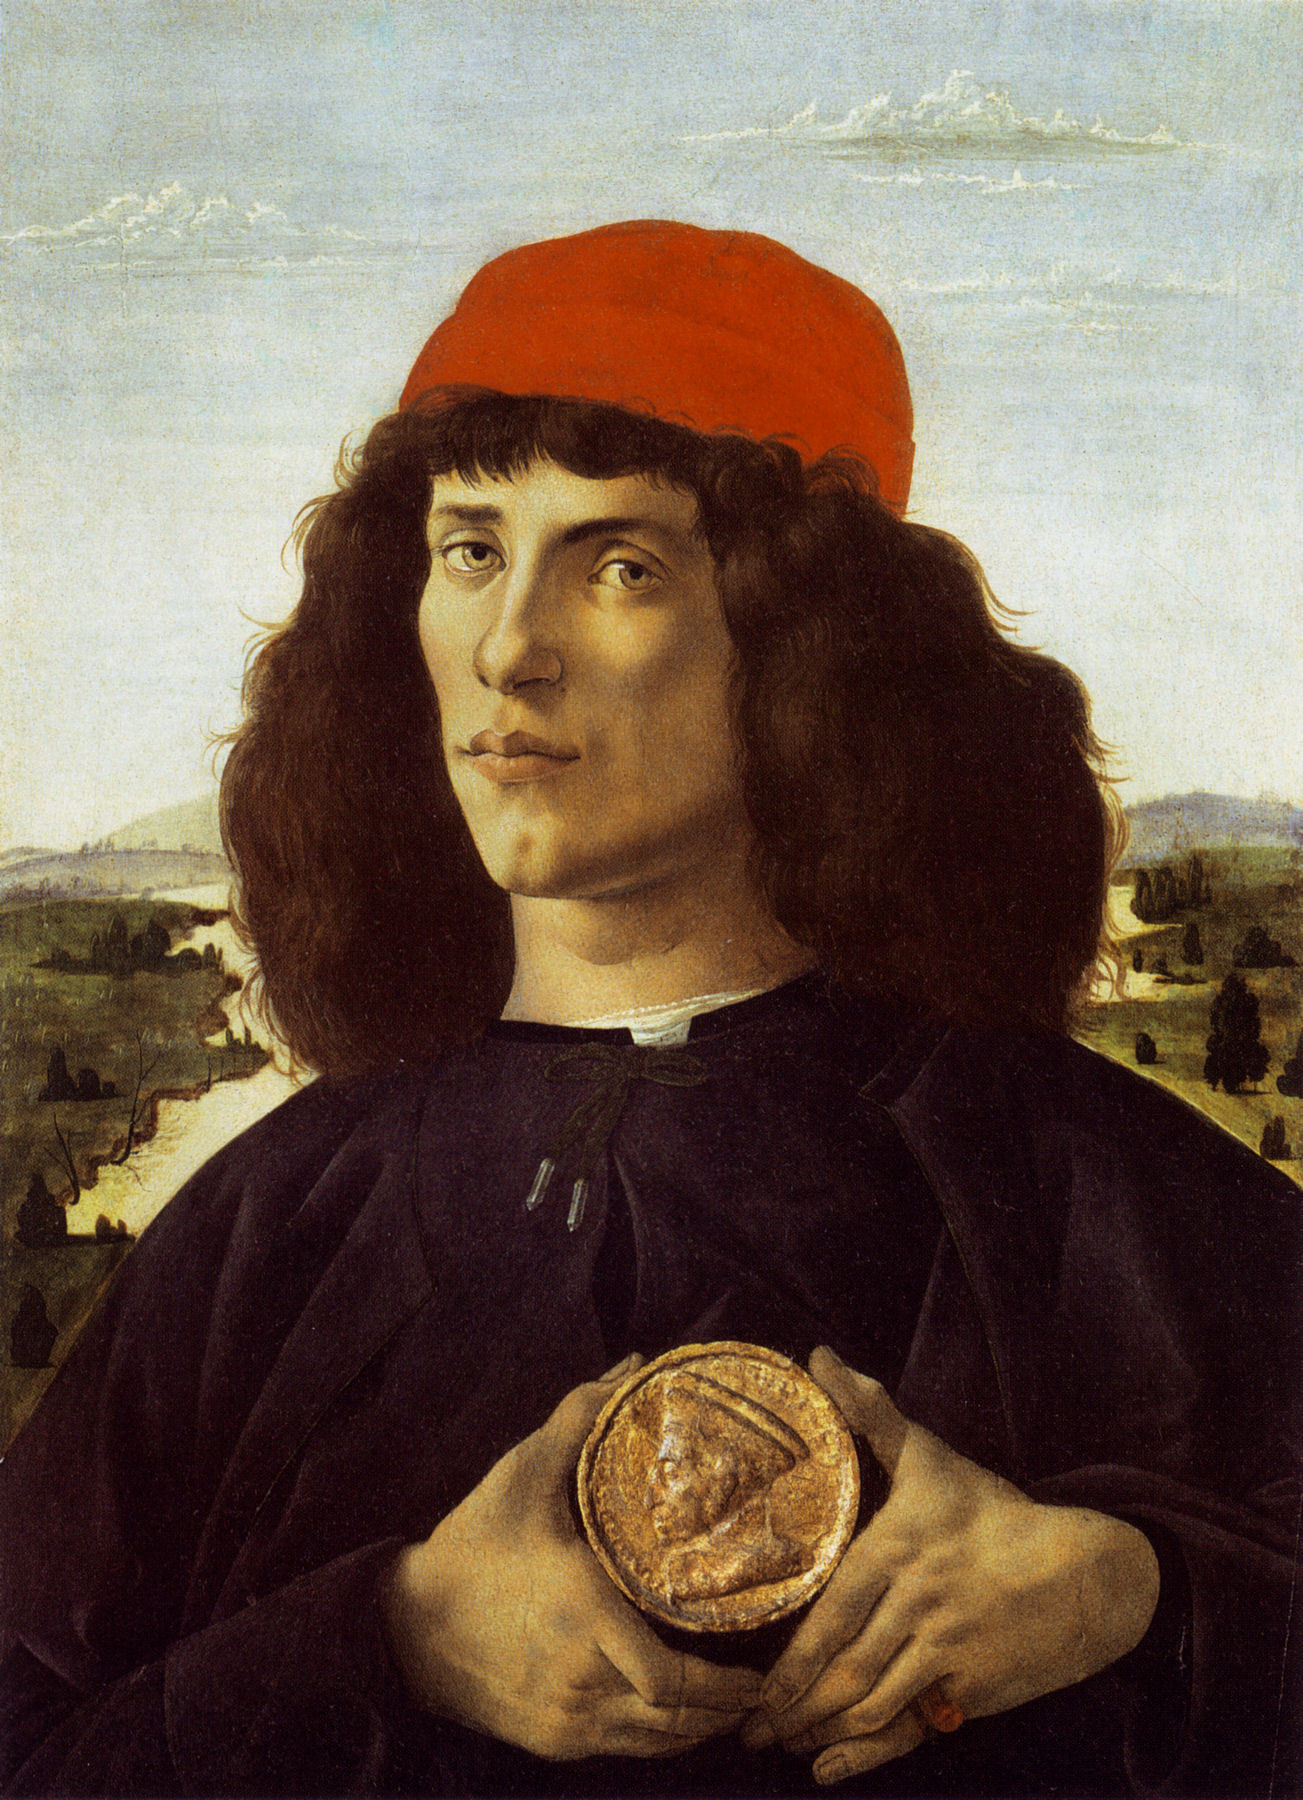 Celebrities in the Renaissance | Art - Digital/famous ...